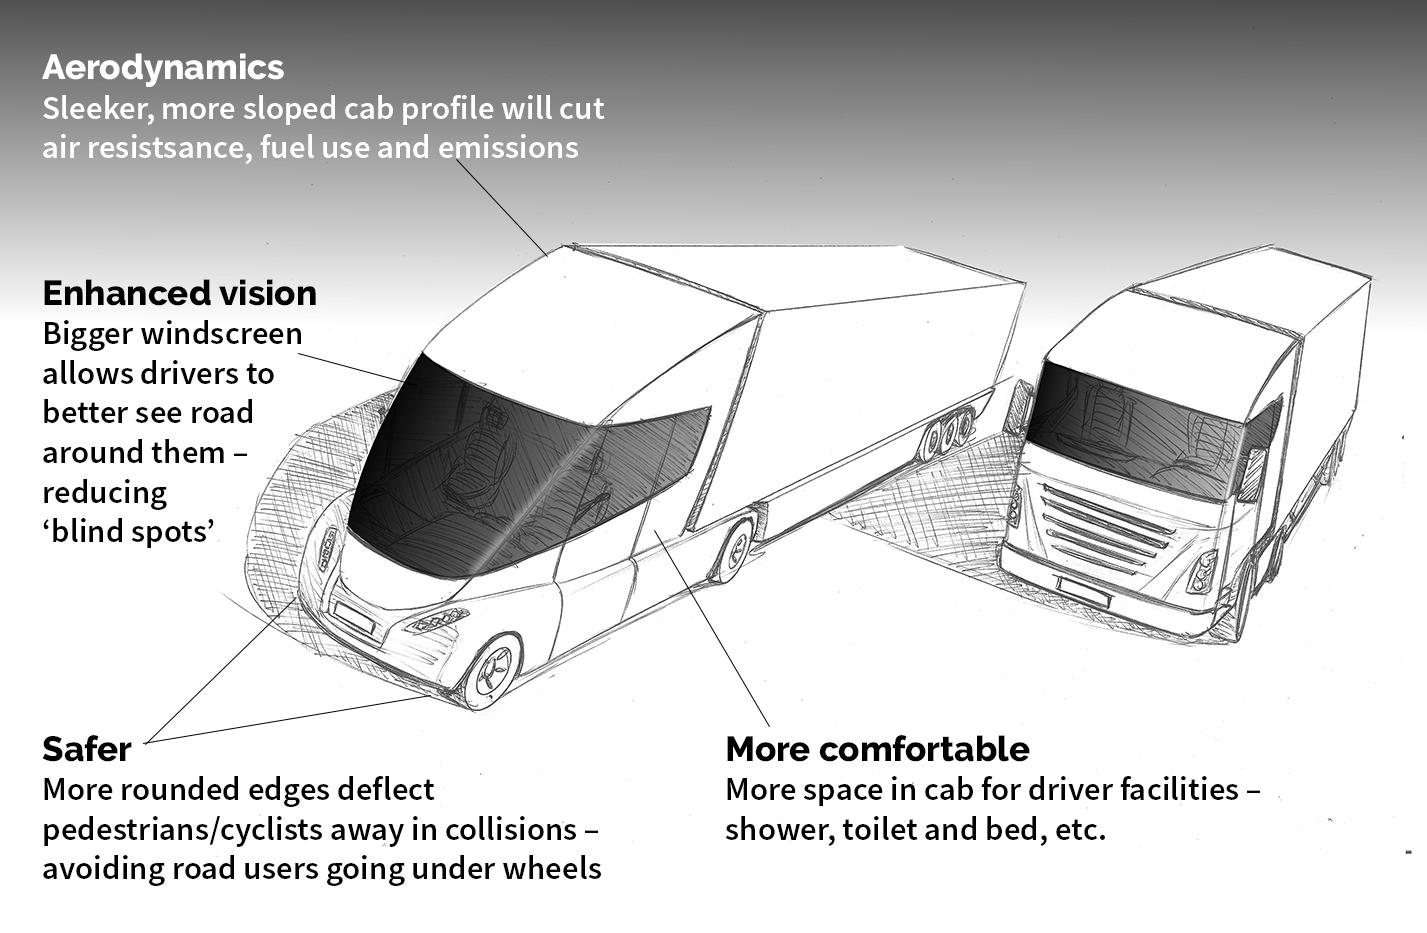 EU-truck-design-regulations